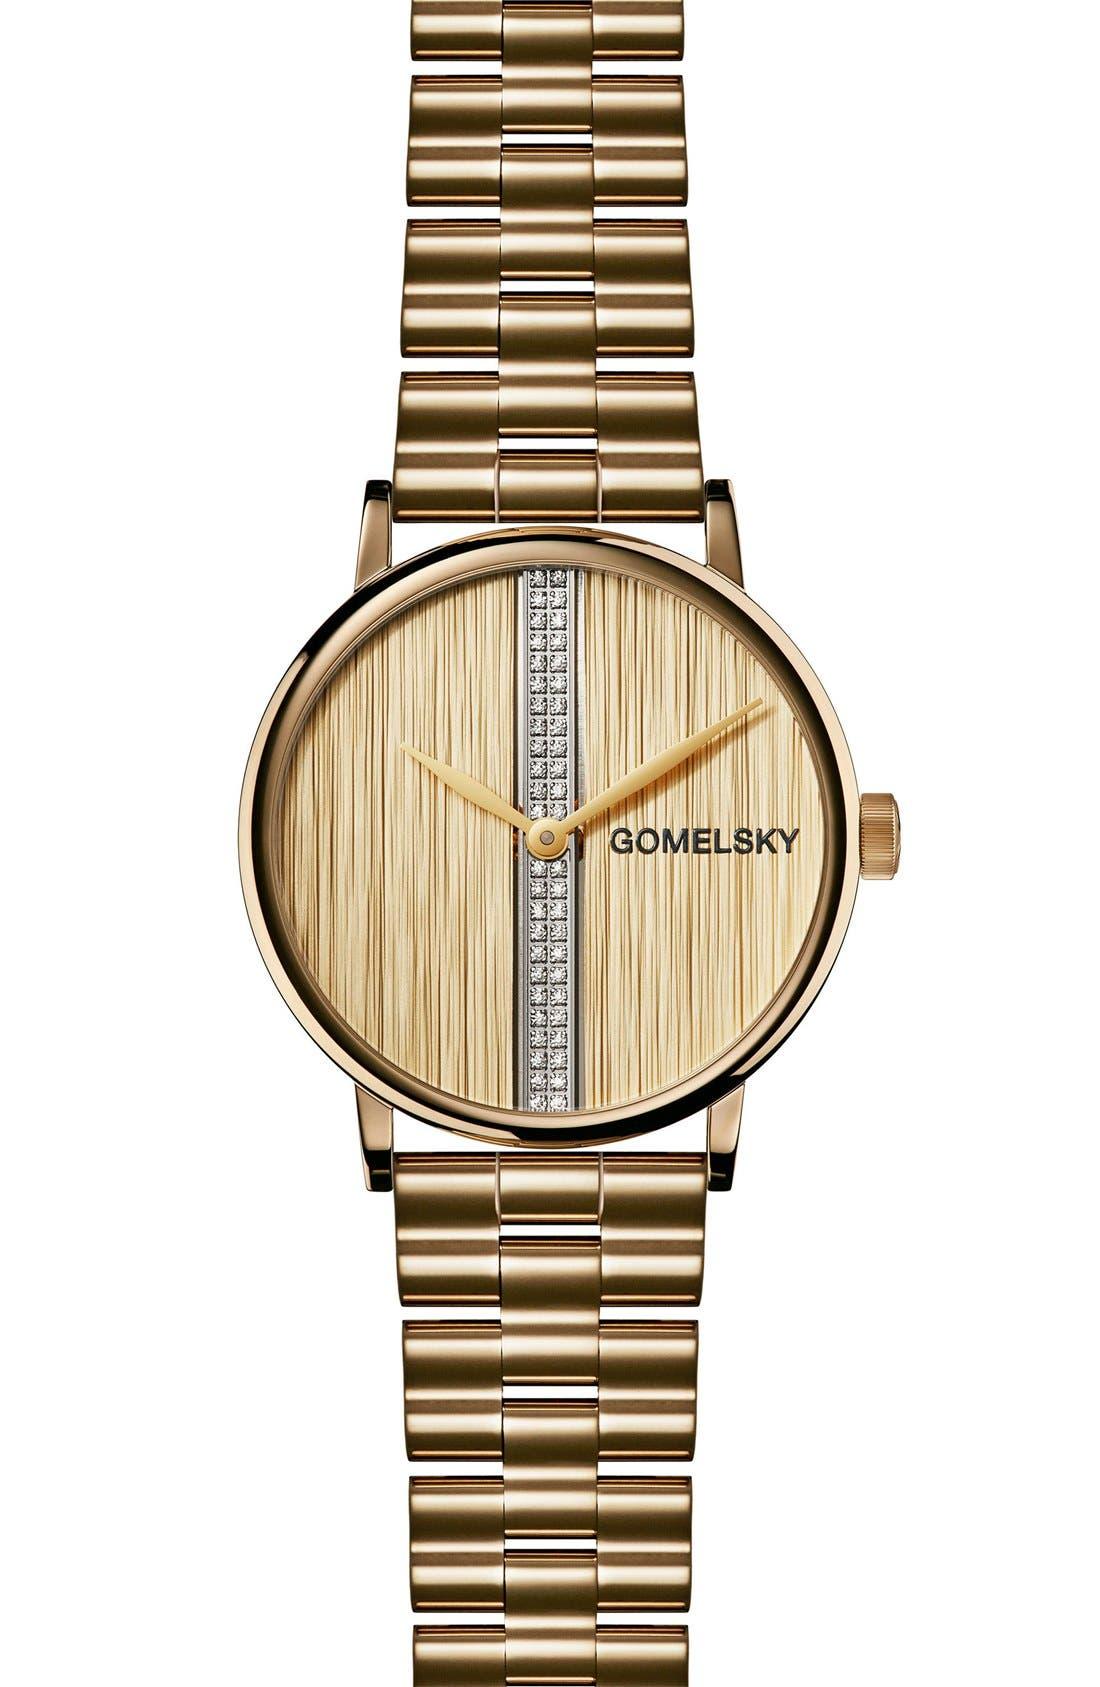 Main Image - Gomelsky The Agnes Varis Diamond Bracelet Watch, 32mm